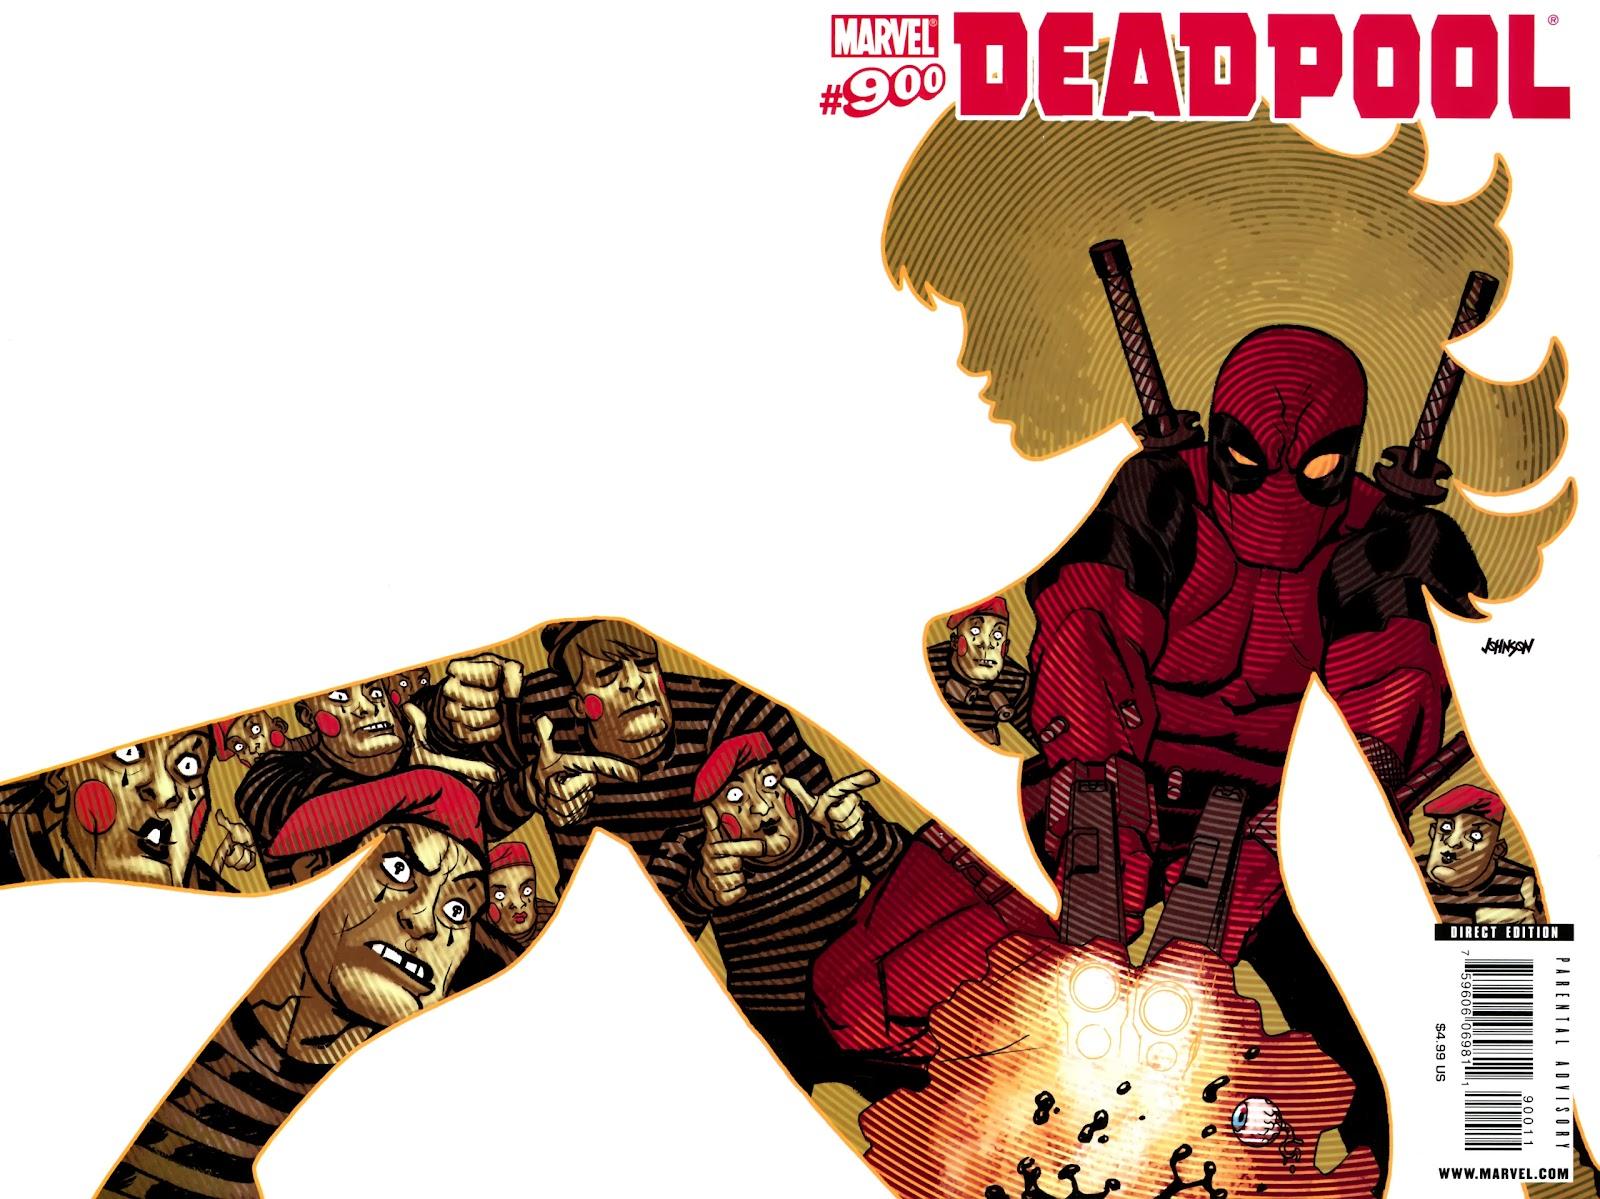 Read online Deadpool (2008) comic -  Issue #900 - 1